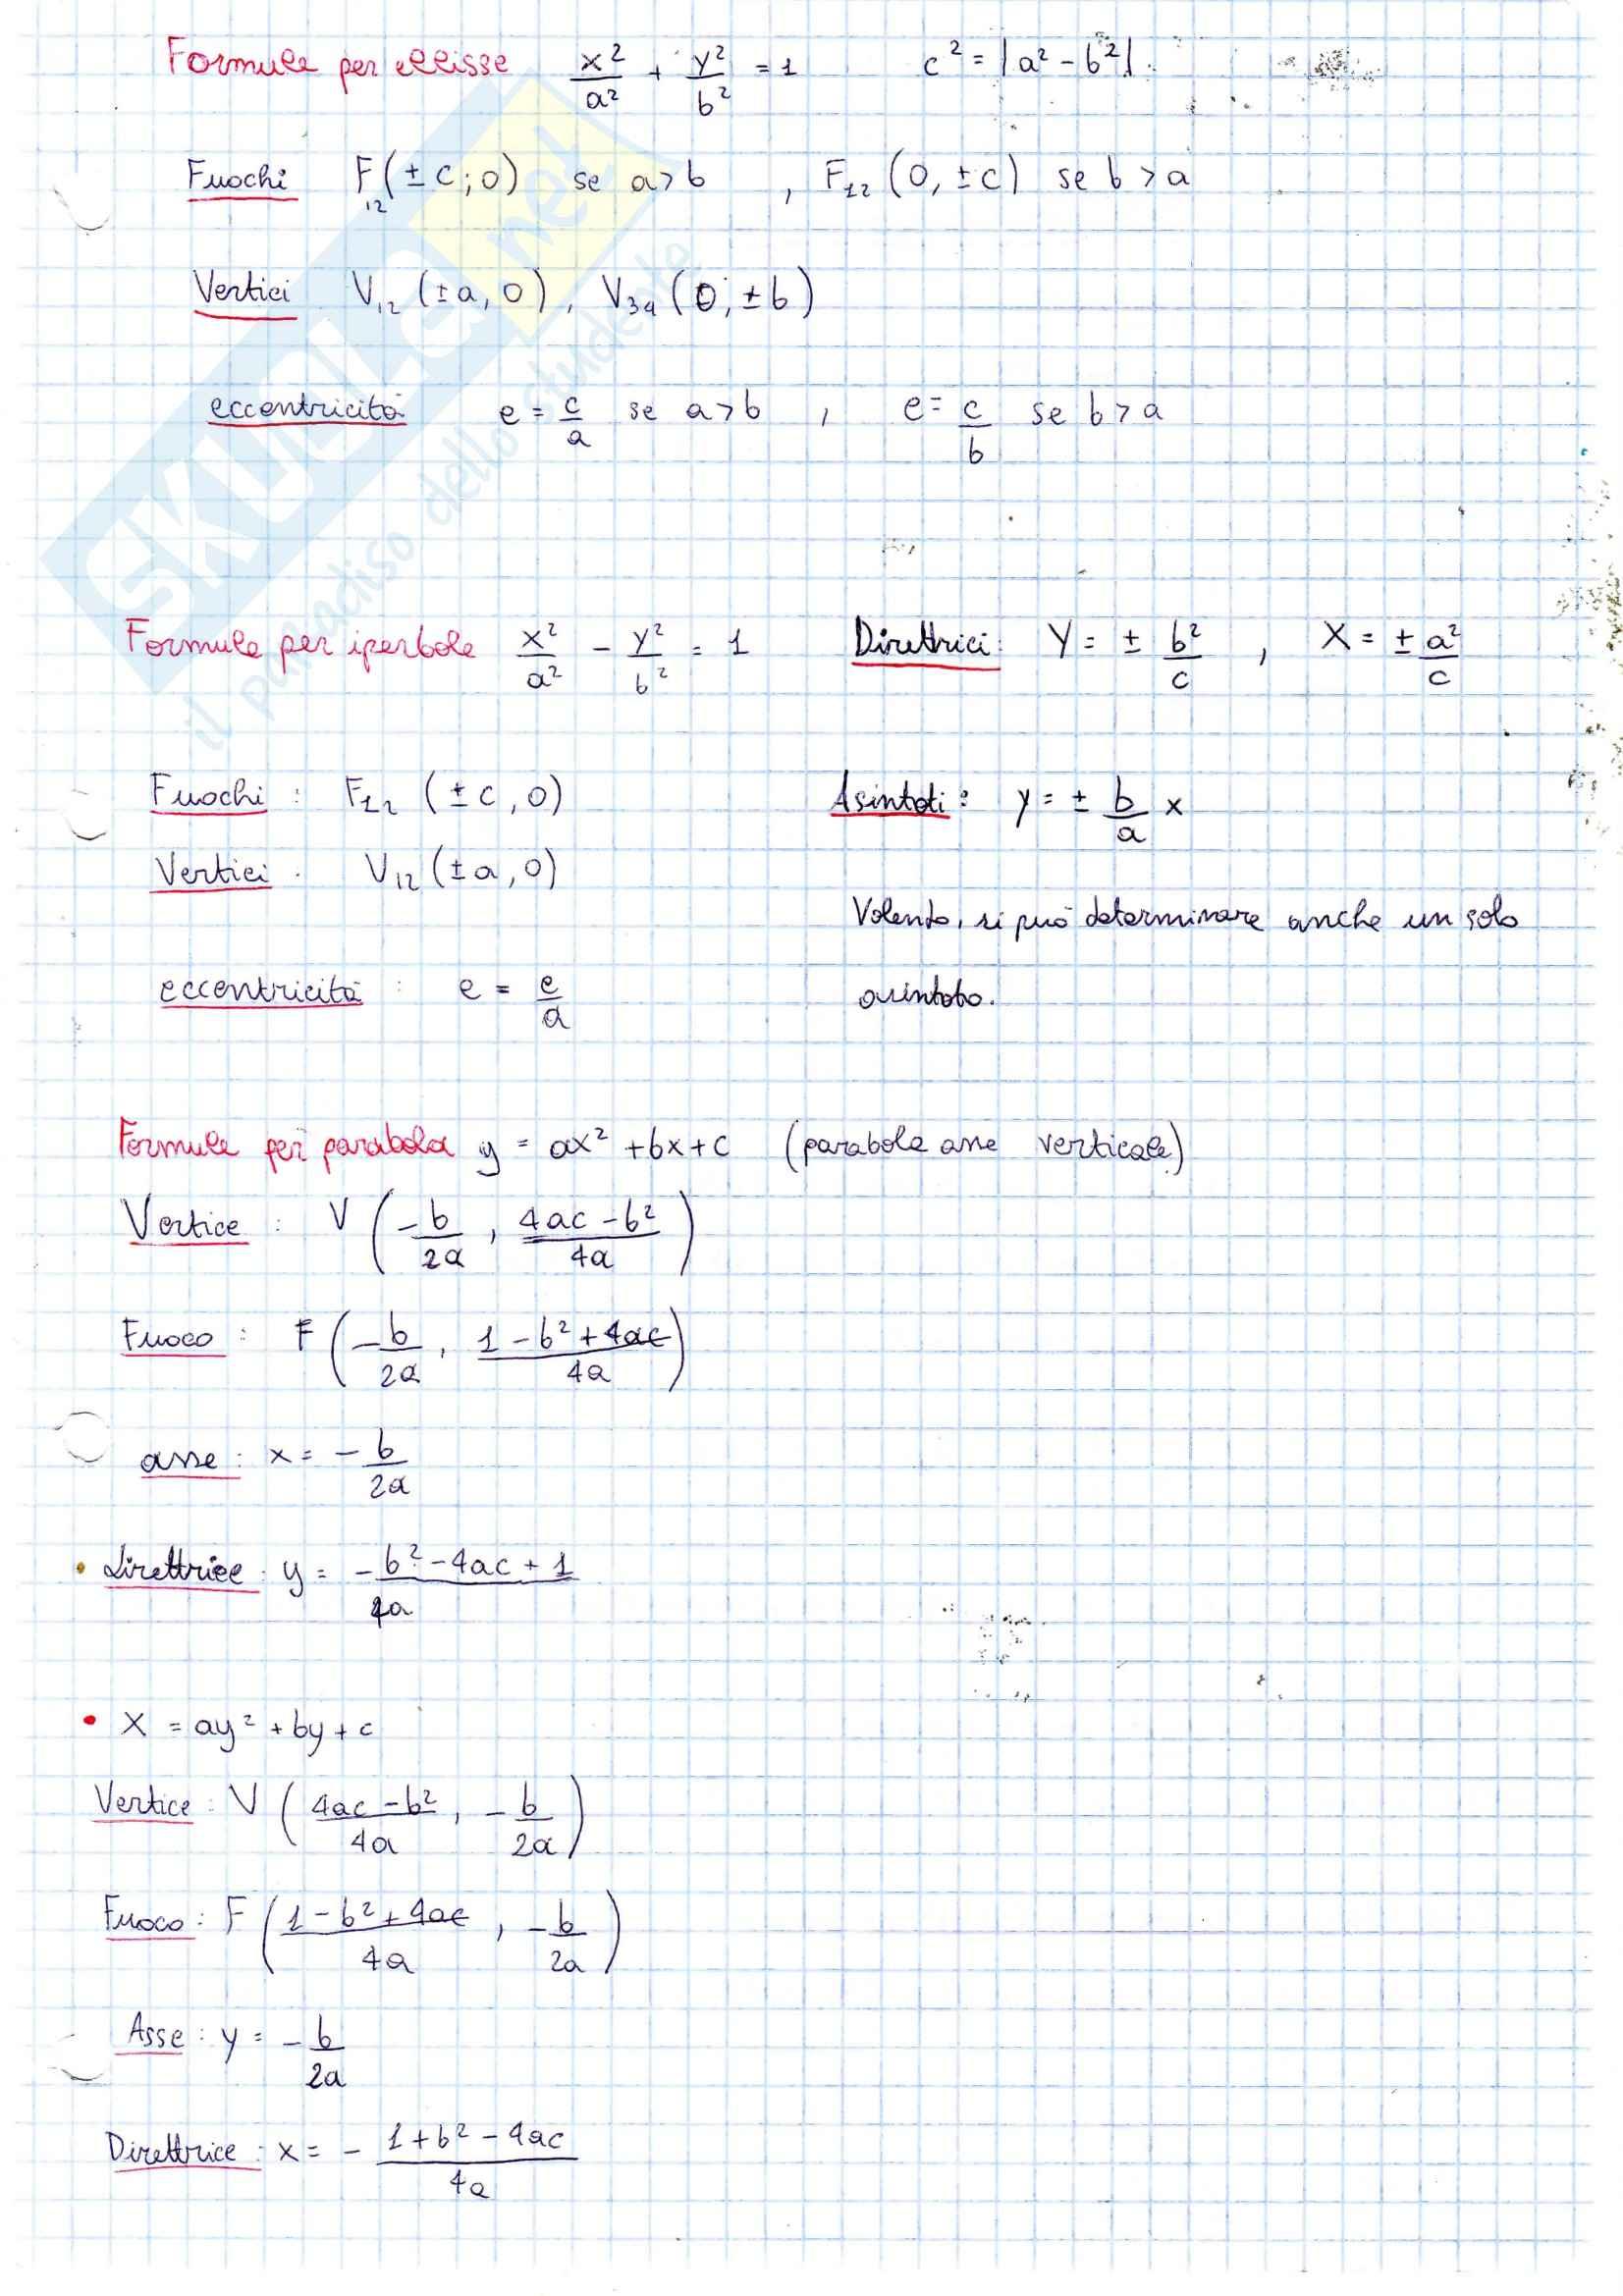 Geometria e algebra  - formule per l'ellisse, per l'Iperbole e per la parabola Pag. 1